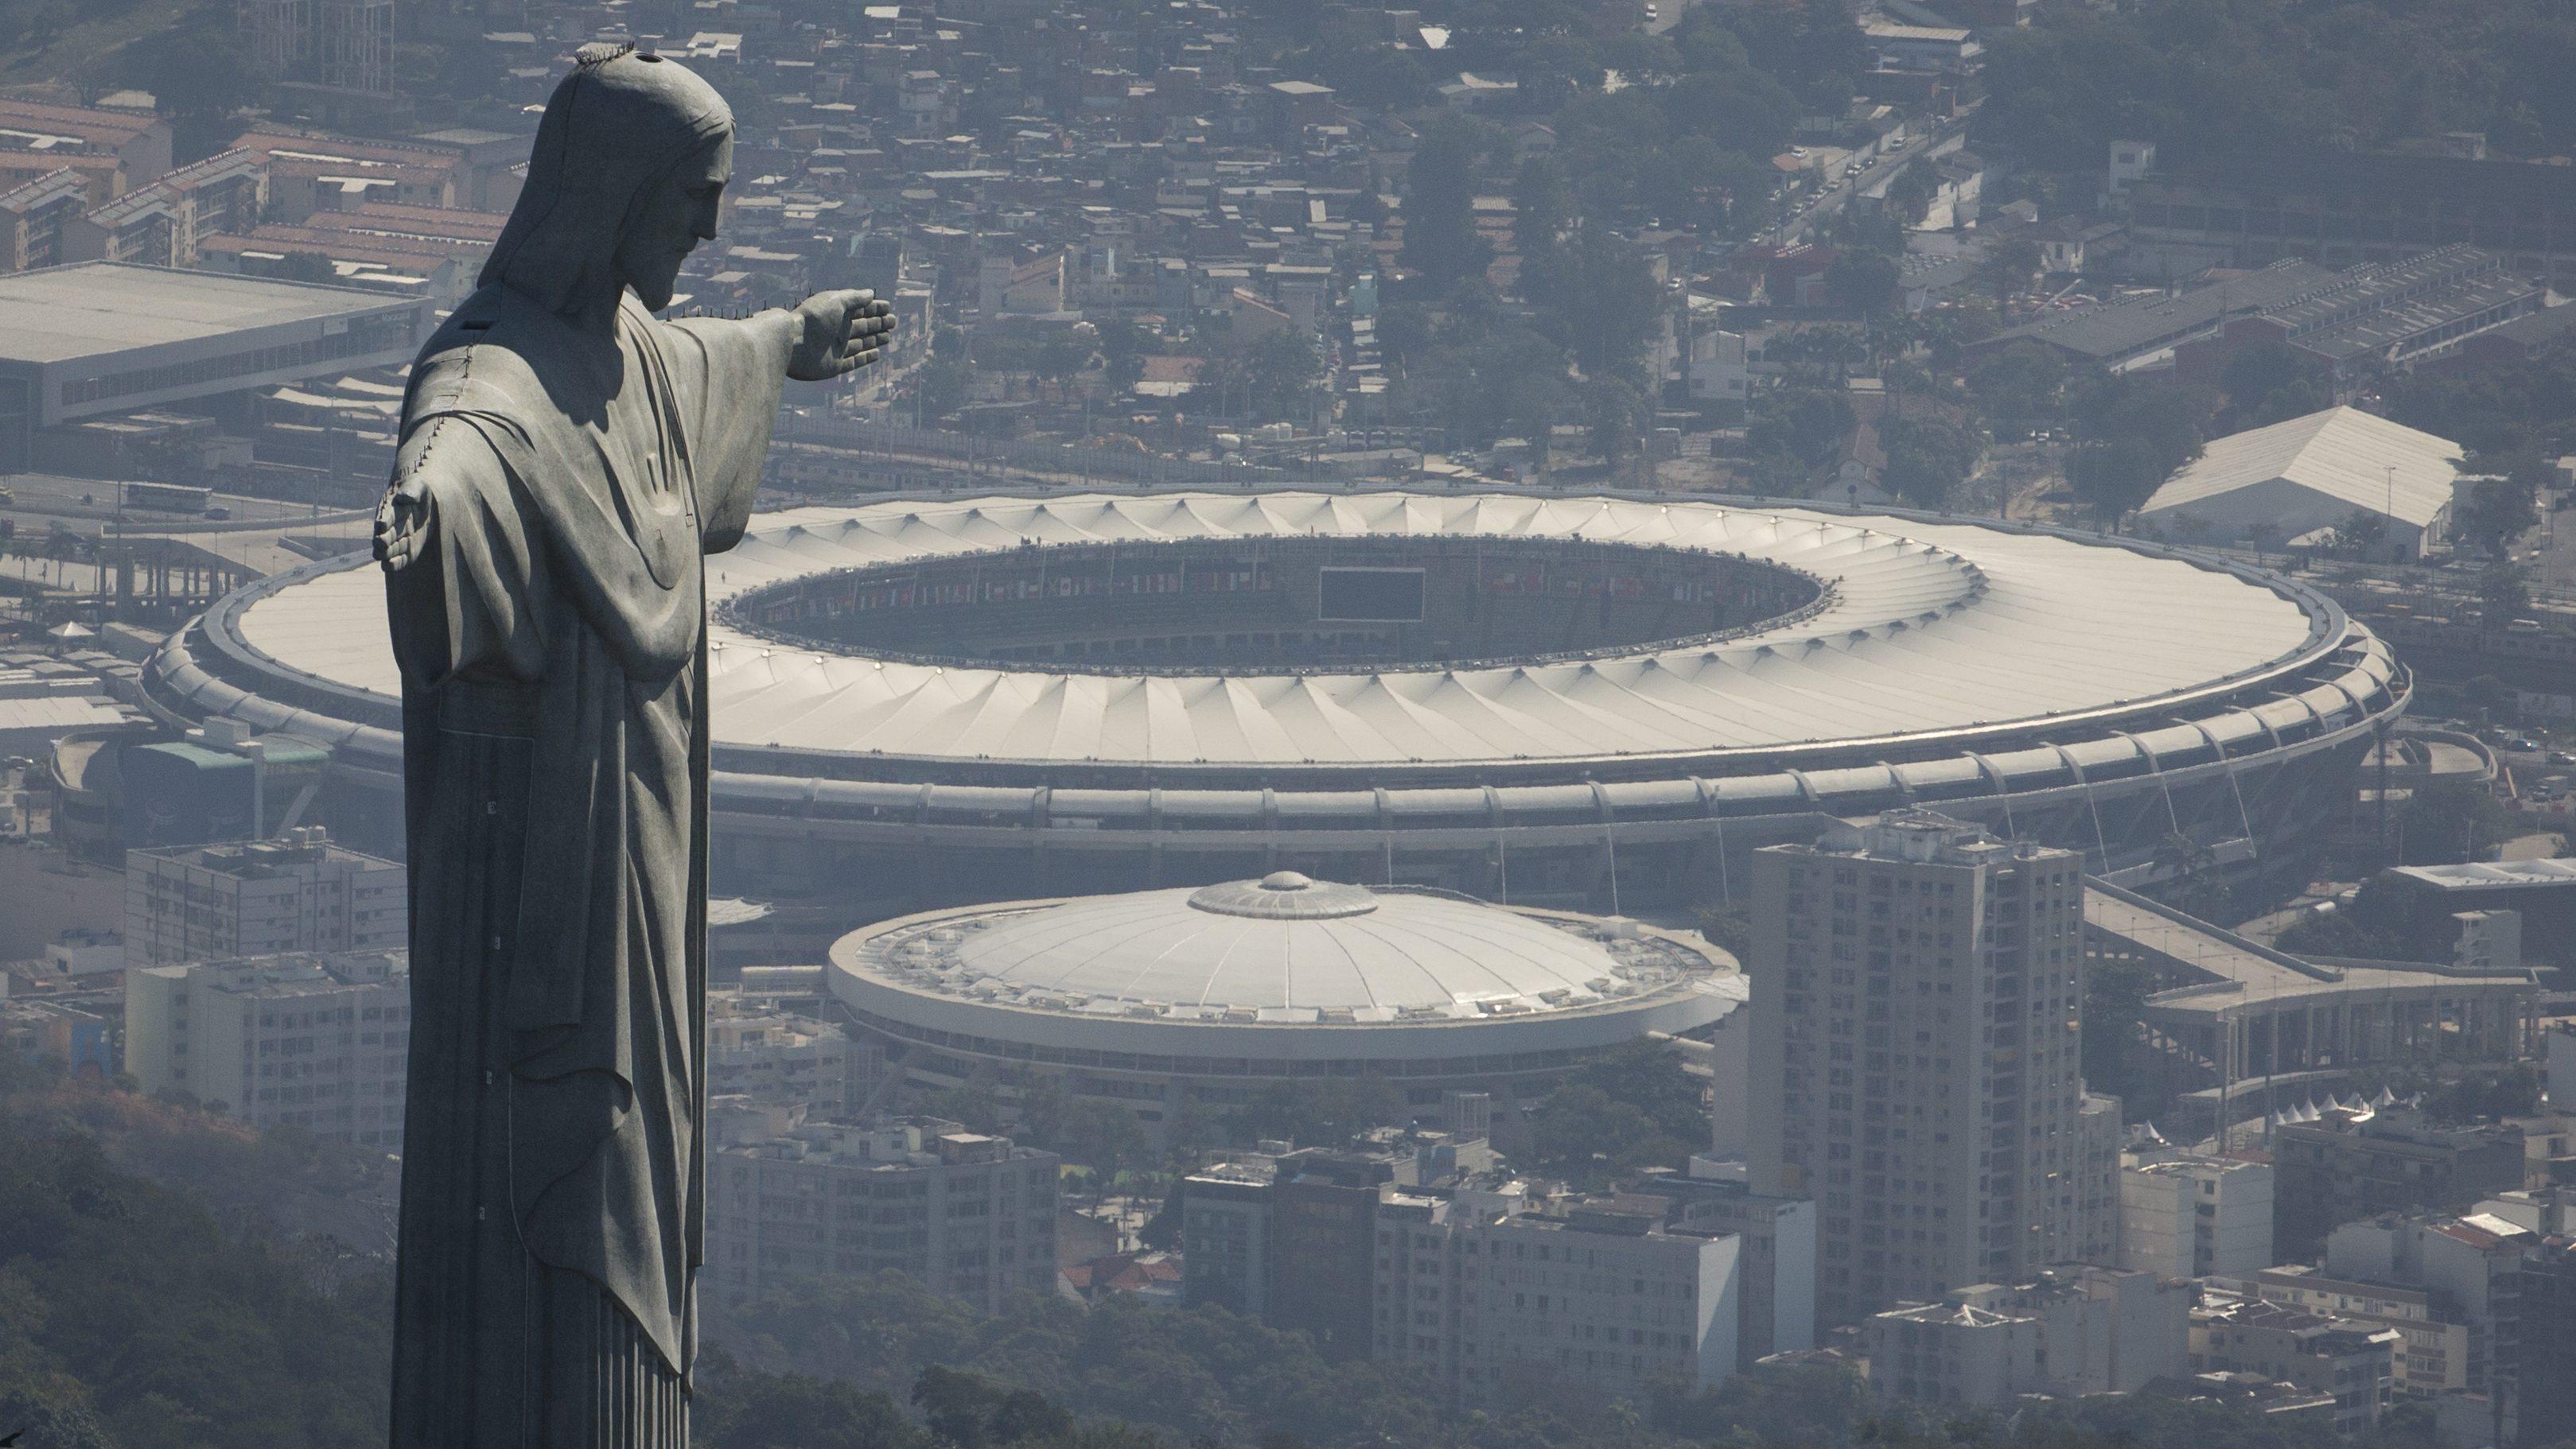 rio olympics christ the redeemer